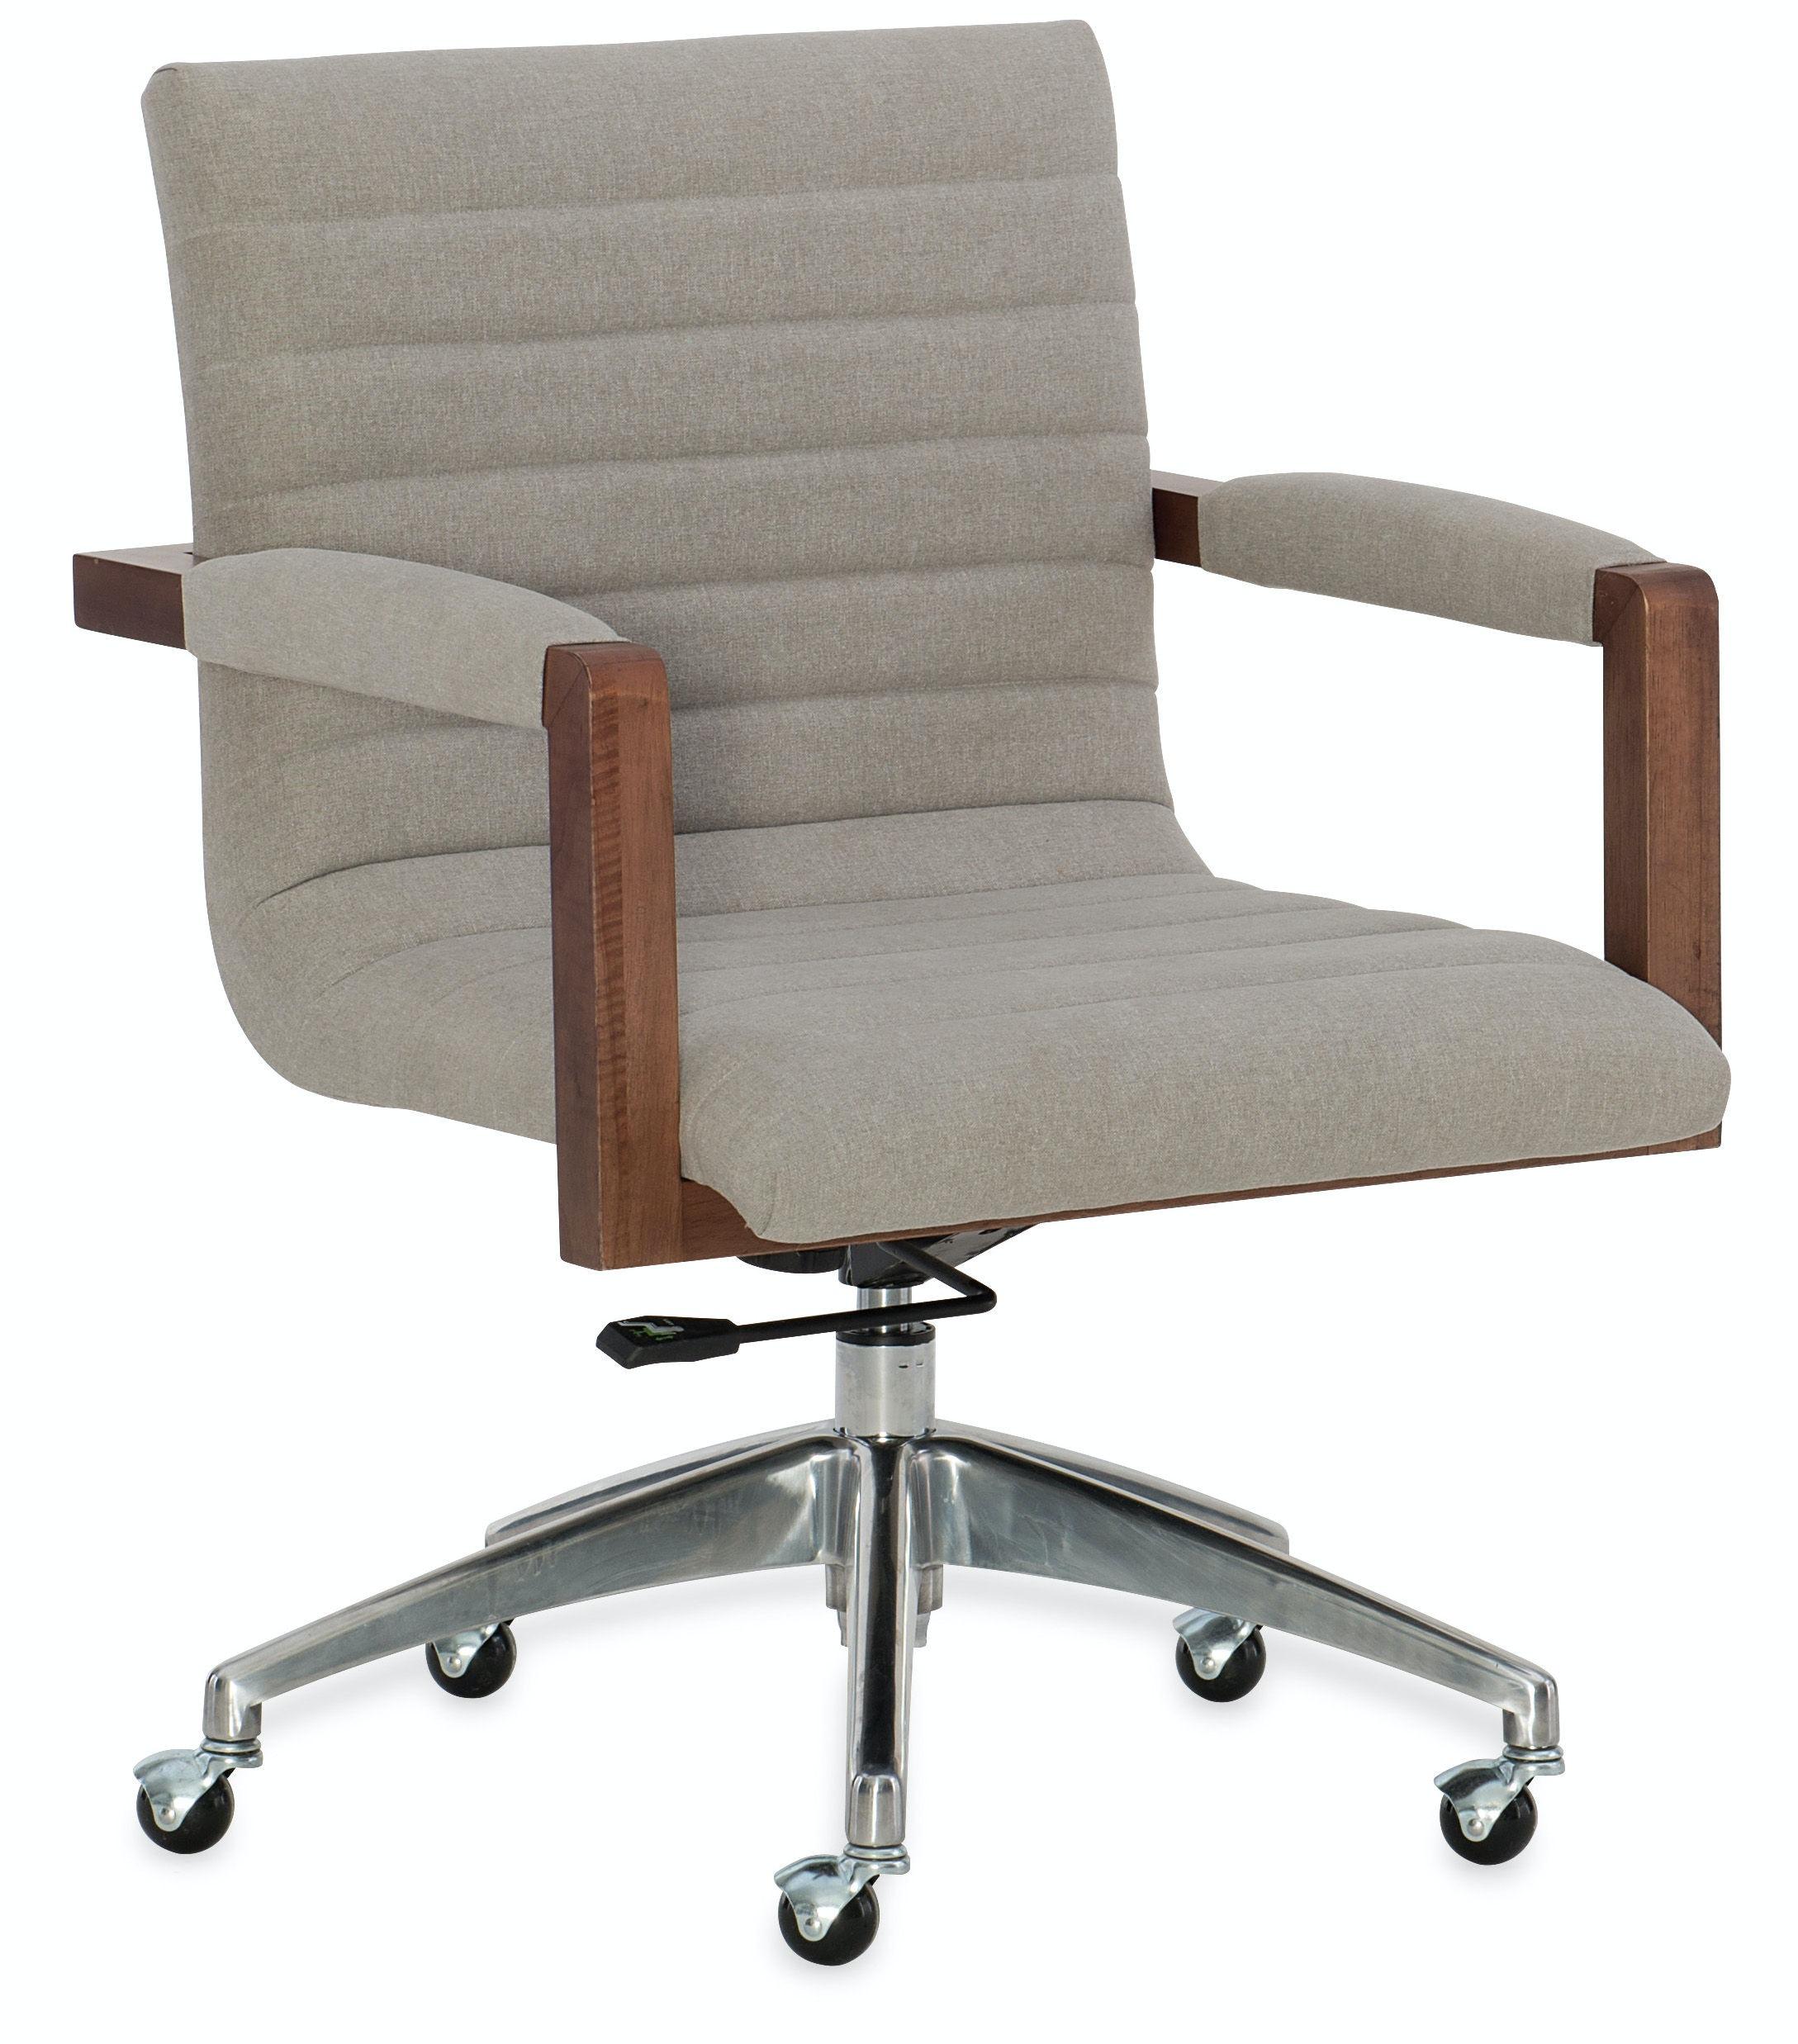 gray swivel office chair 75 vintage wooden. 1650-30220-MWD. Elon Swivel Desk Chair Gray Swivel Office Chair 75 Vintage Wooden T